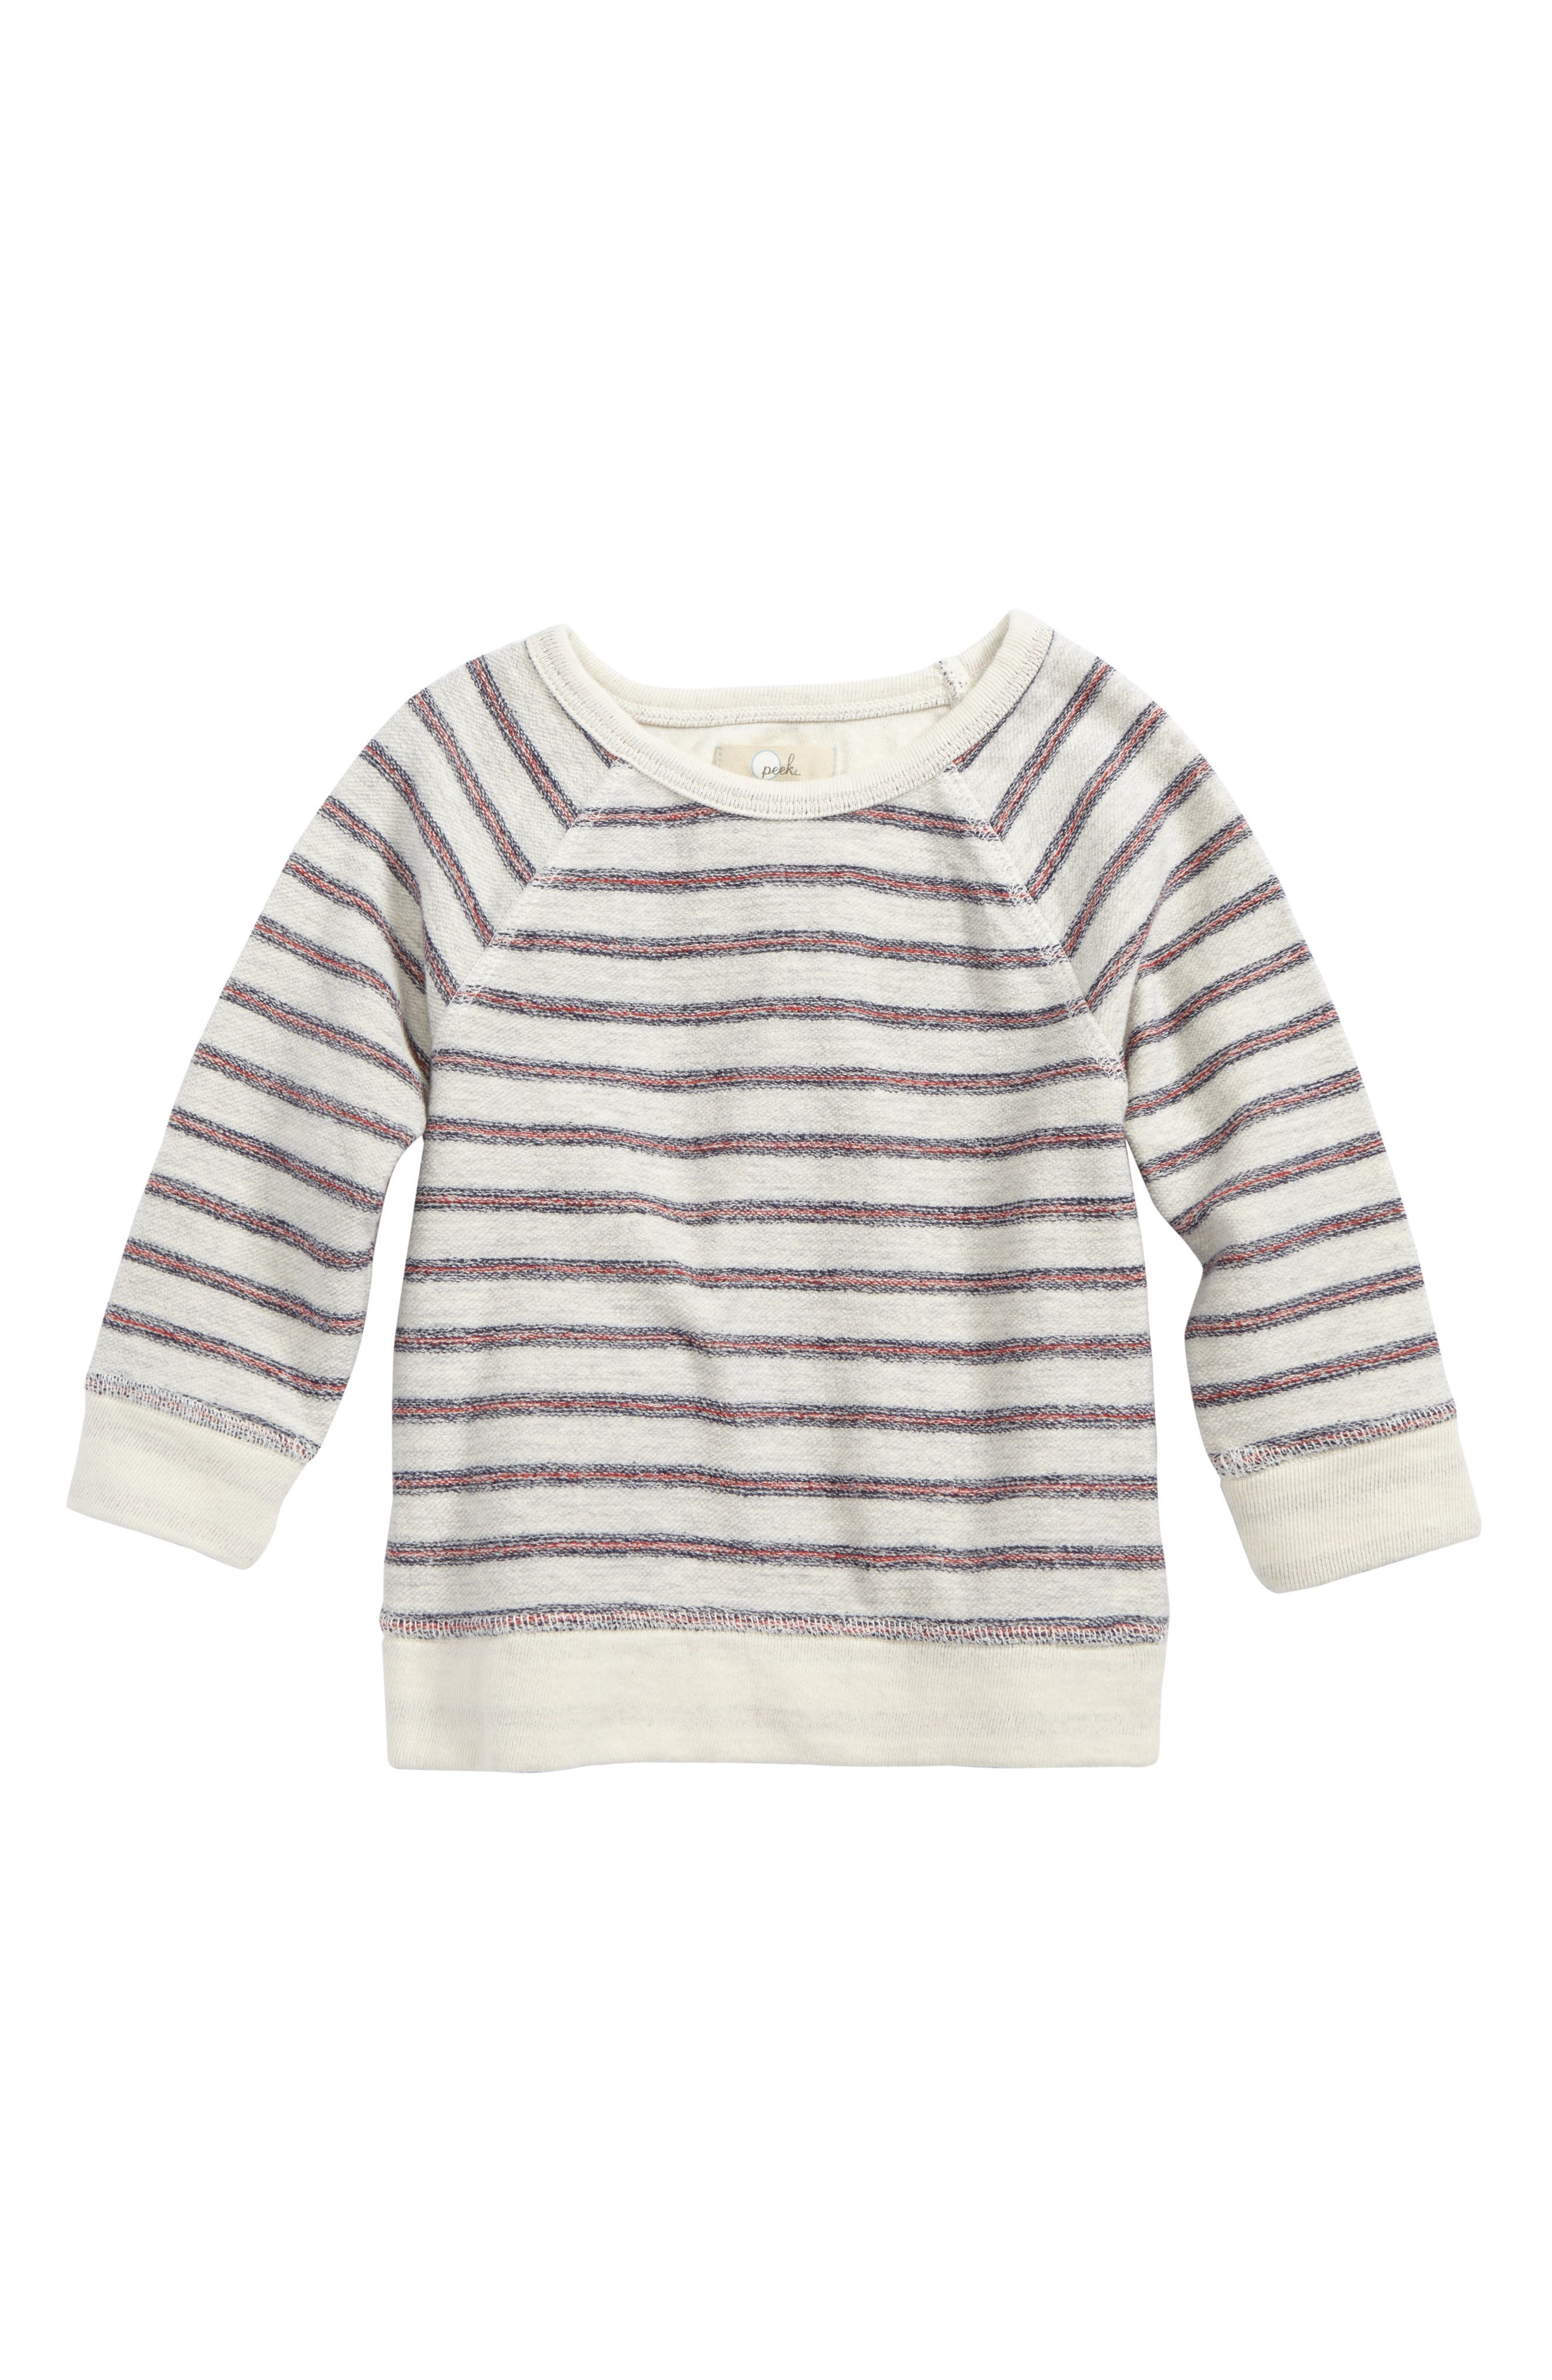 Peek Ziggy Stripe Sweatshirt,                             Main thumbnail 1, color,                             Cream